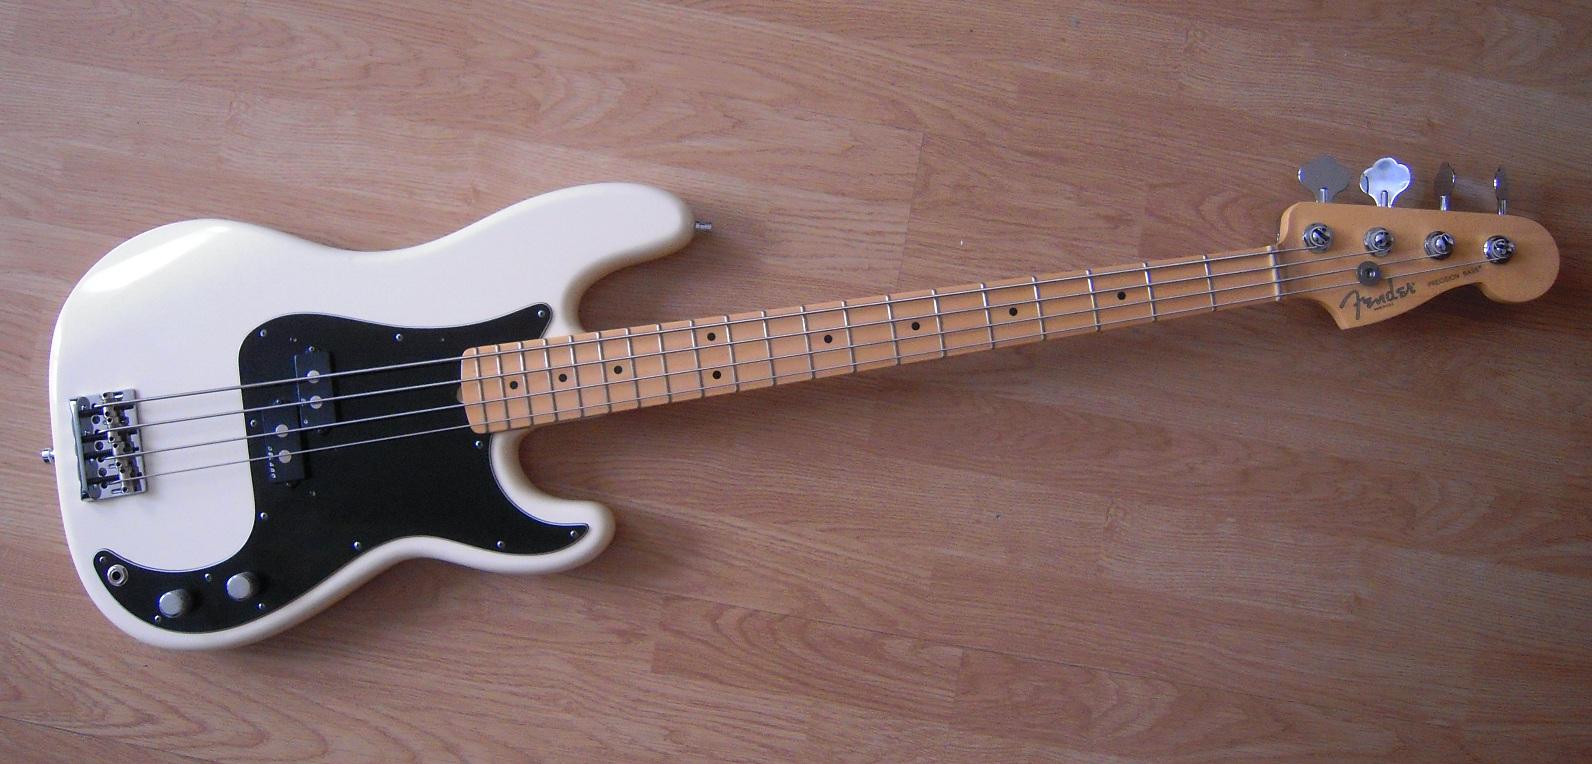 fender american standard precision bass 2012 current image 498359 audiofanzine. Black Bedroom Furniture Sets. Home Design Ideas